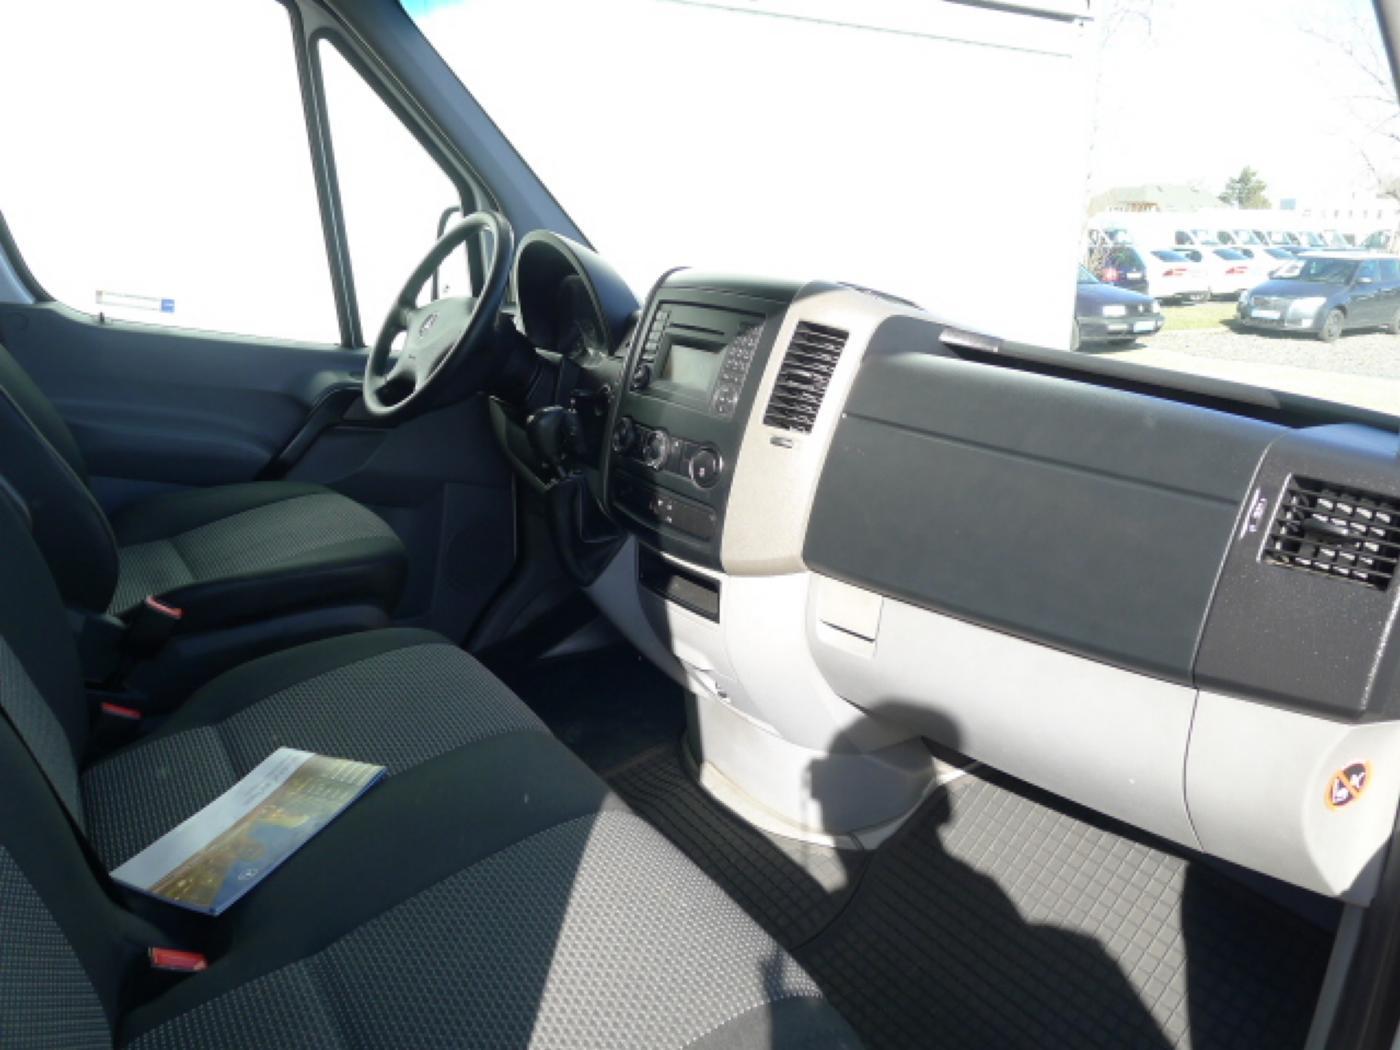 Mercedes-Benz Sprinter 319 CDI Maxi XXL + Klima Akce!!!! - 10